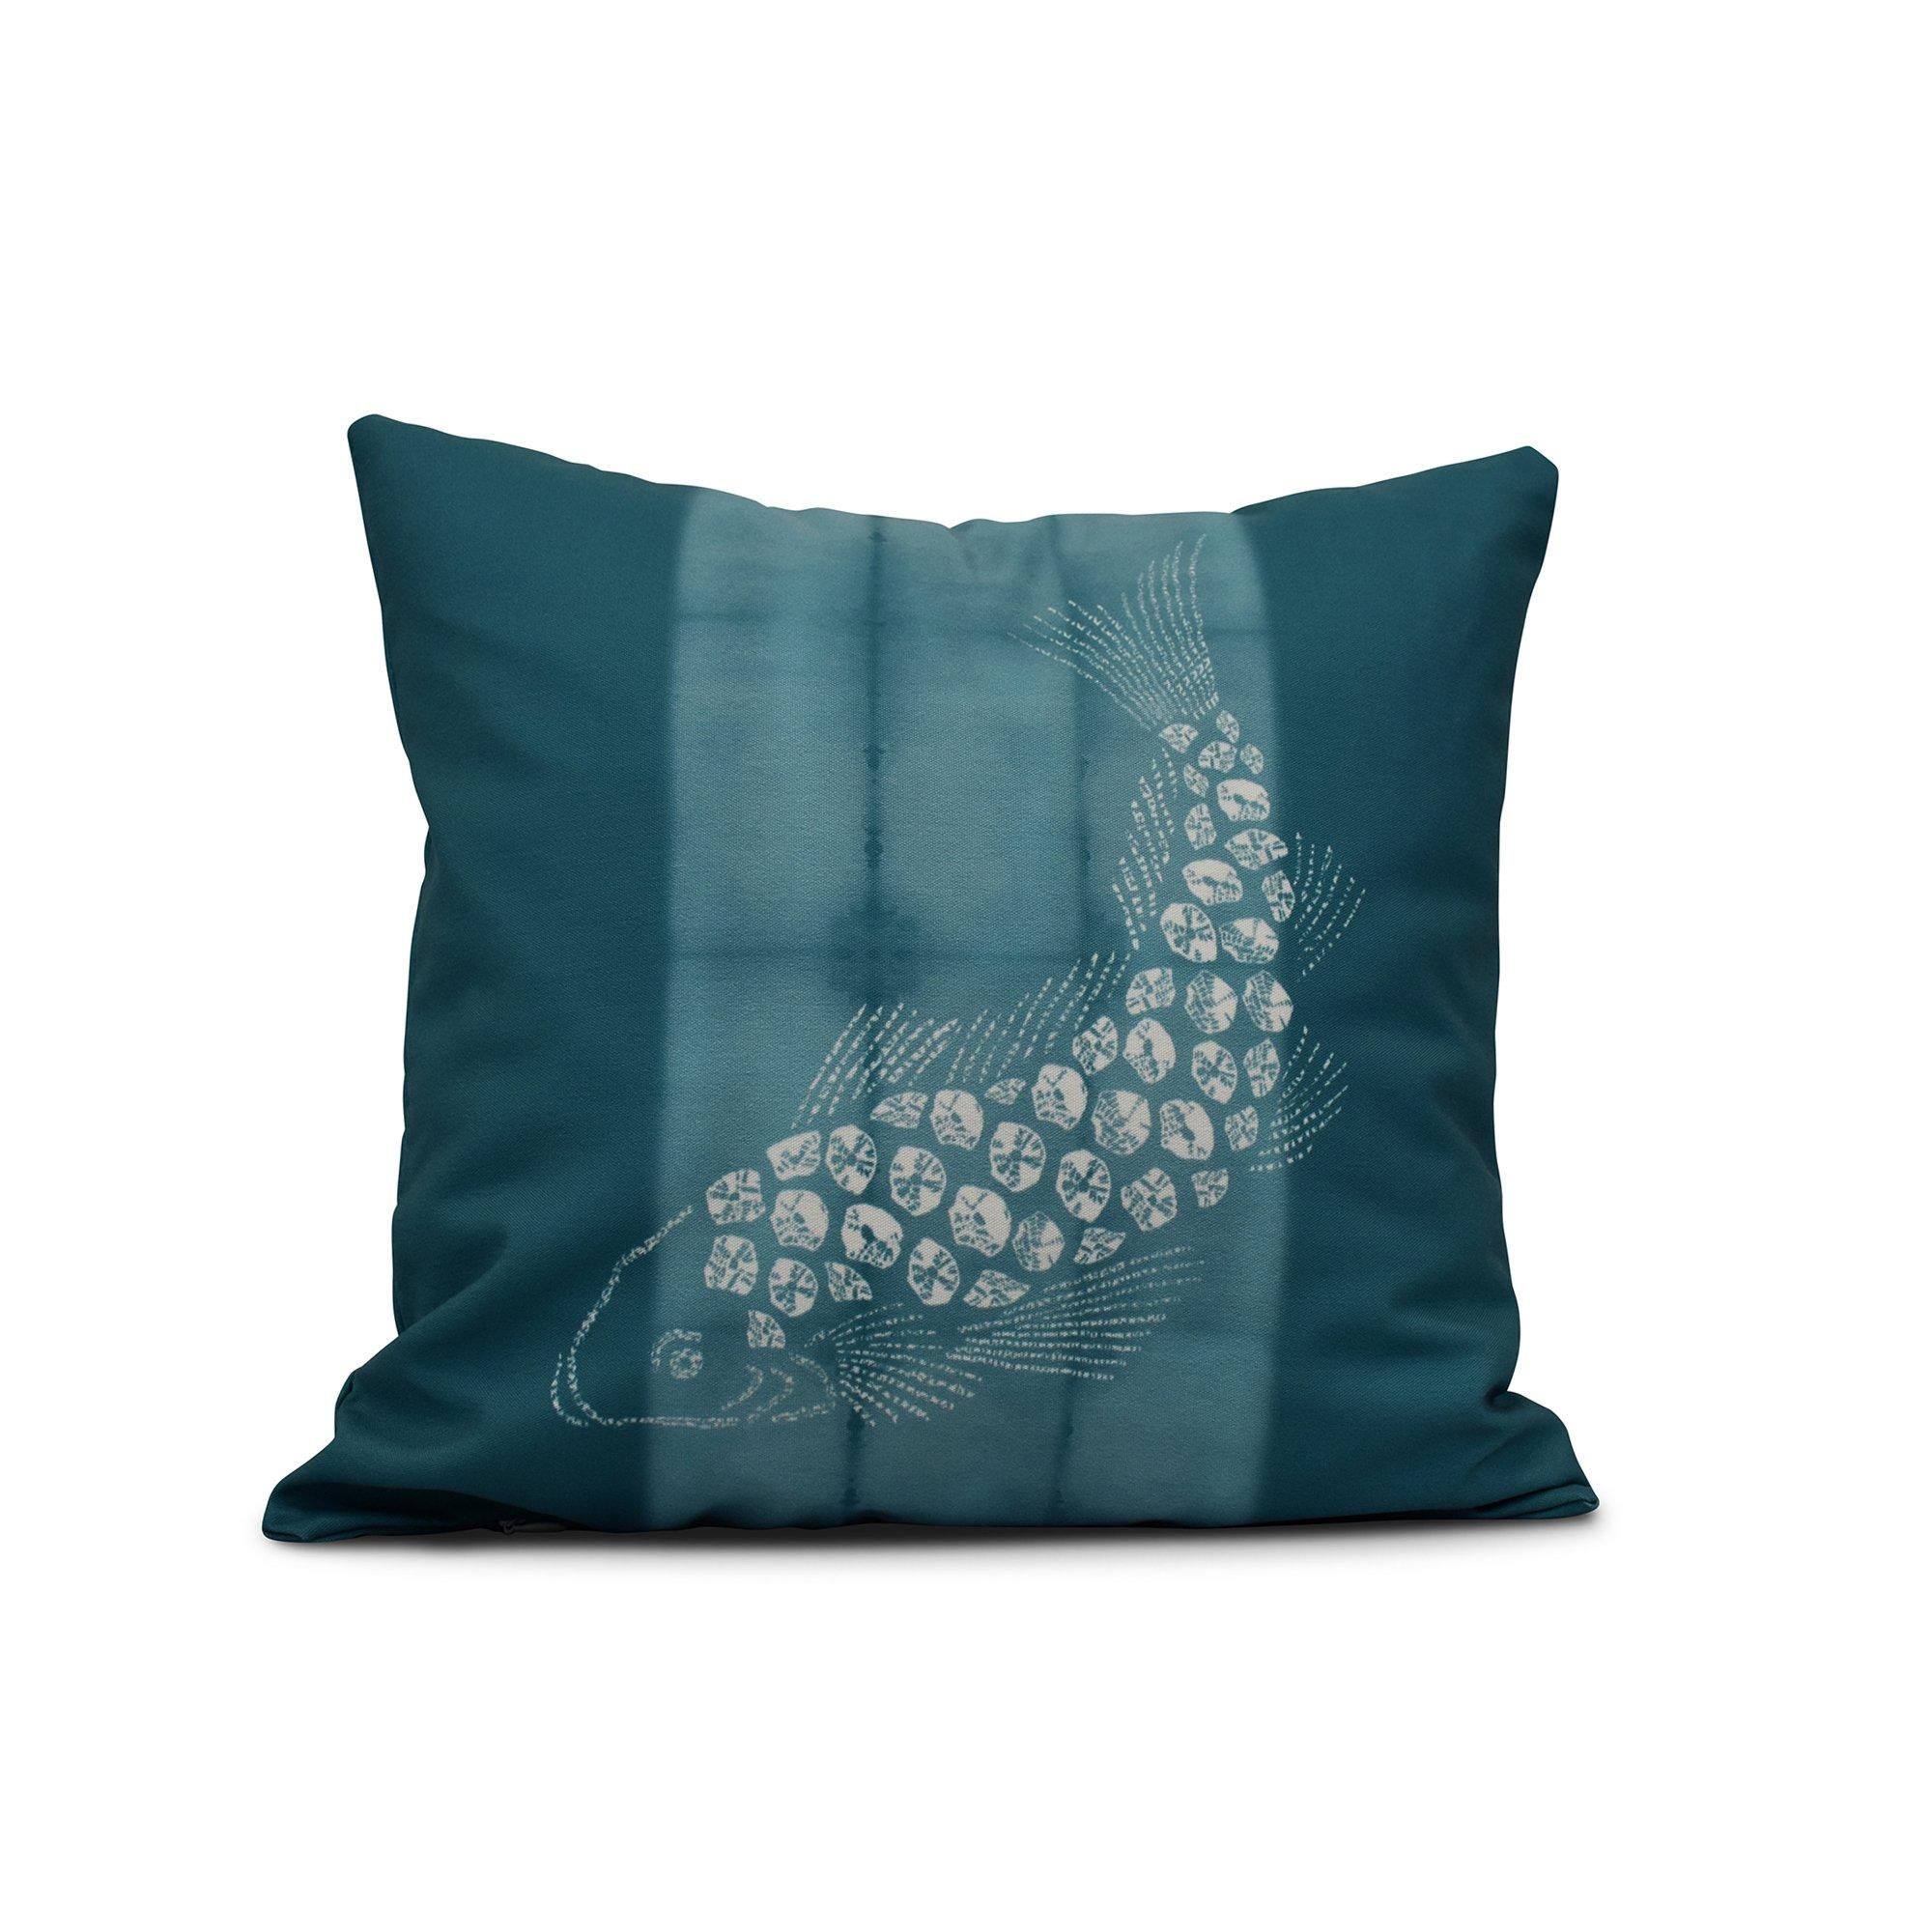 E by design Fish Pool Animal Print Pillow, 16'' x 16'', Teal